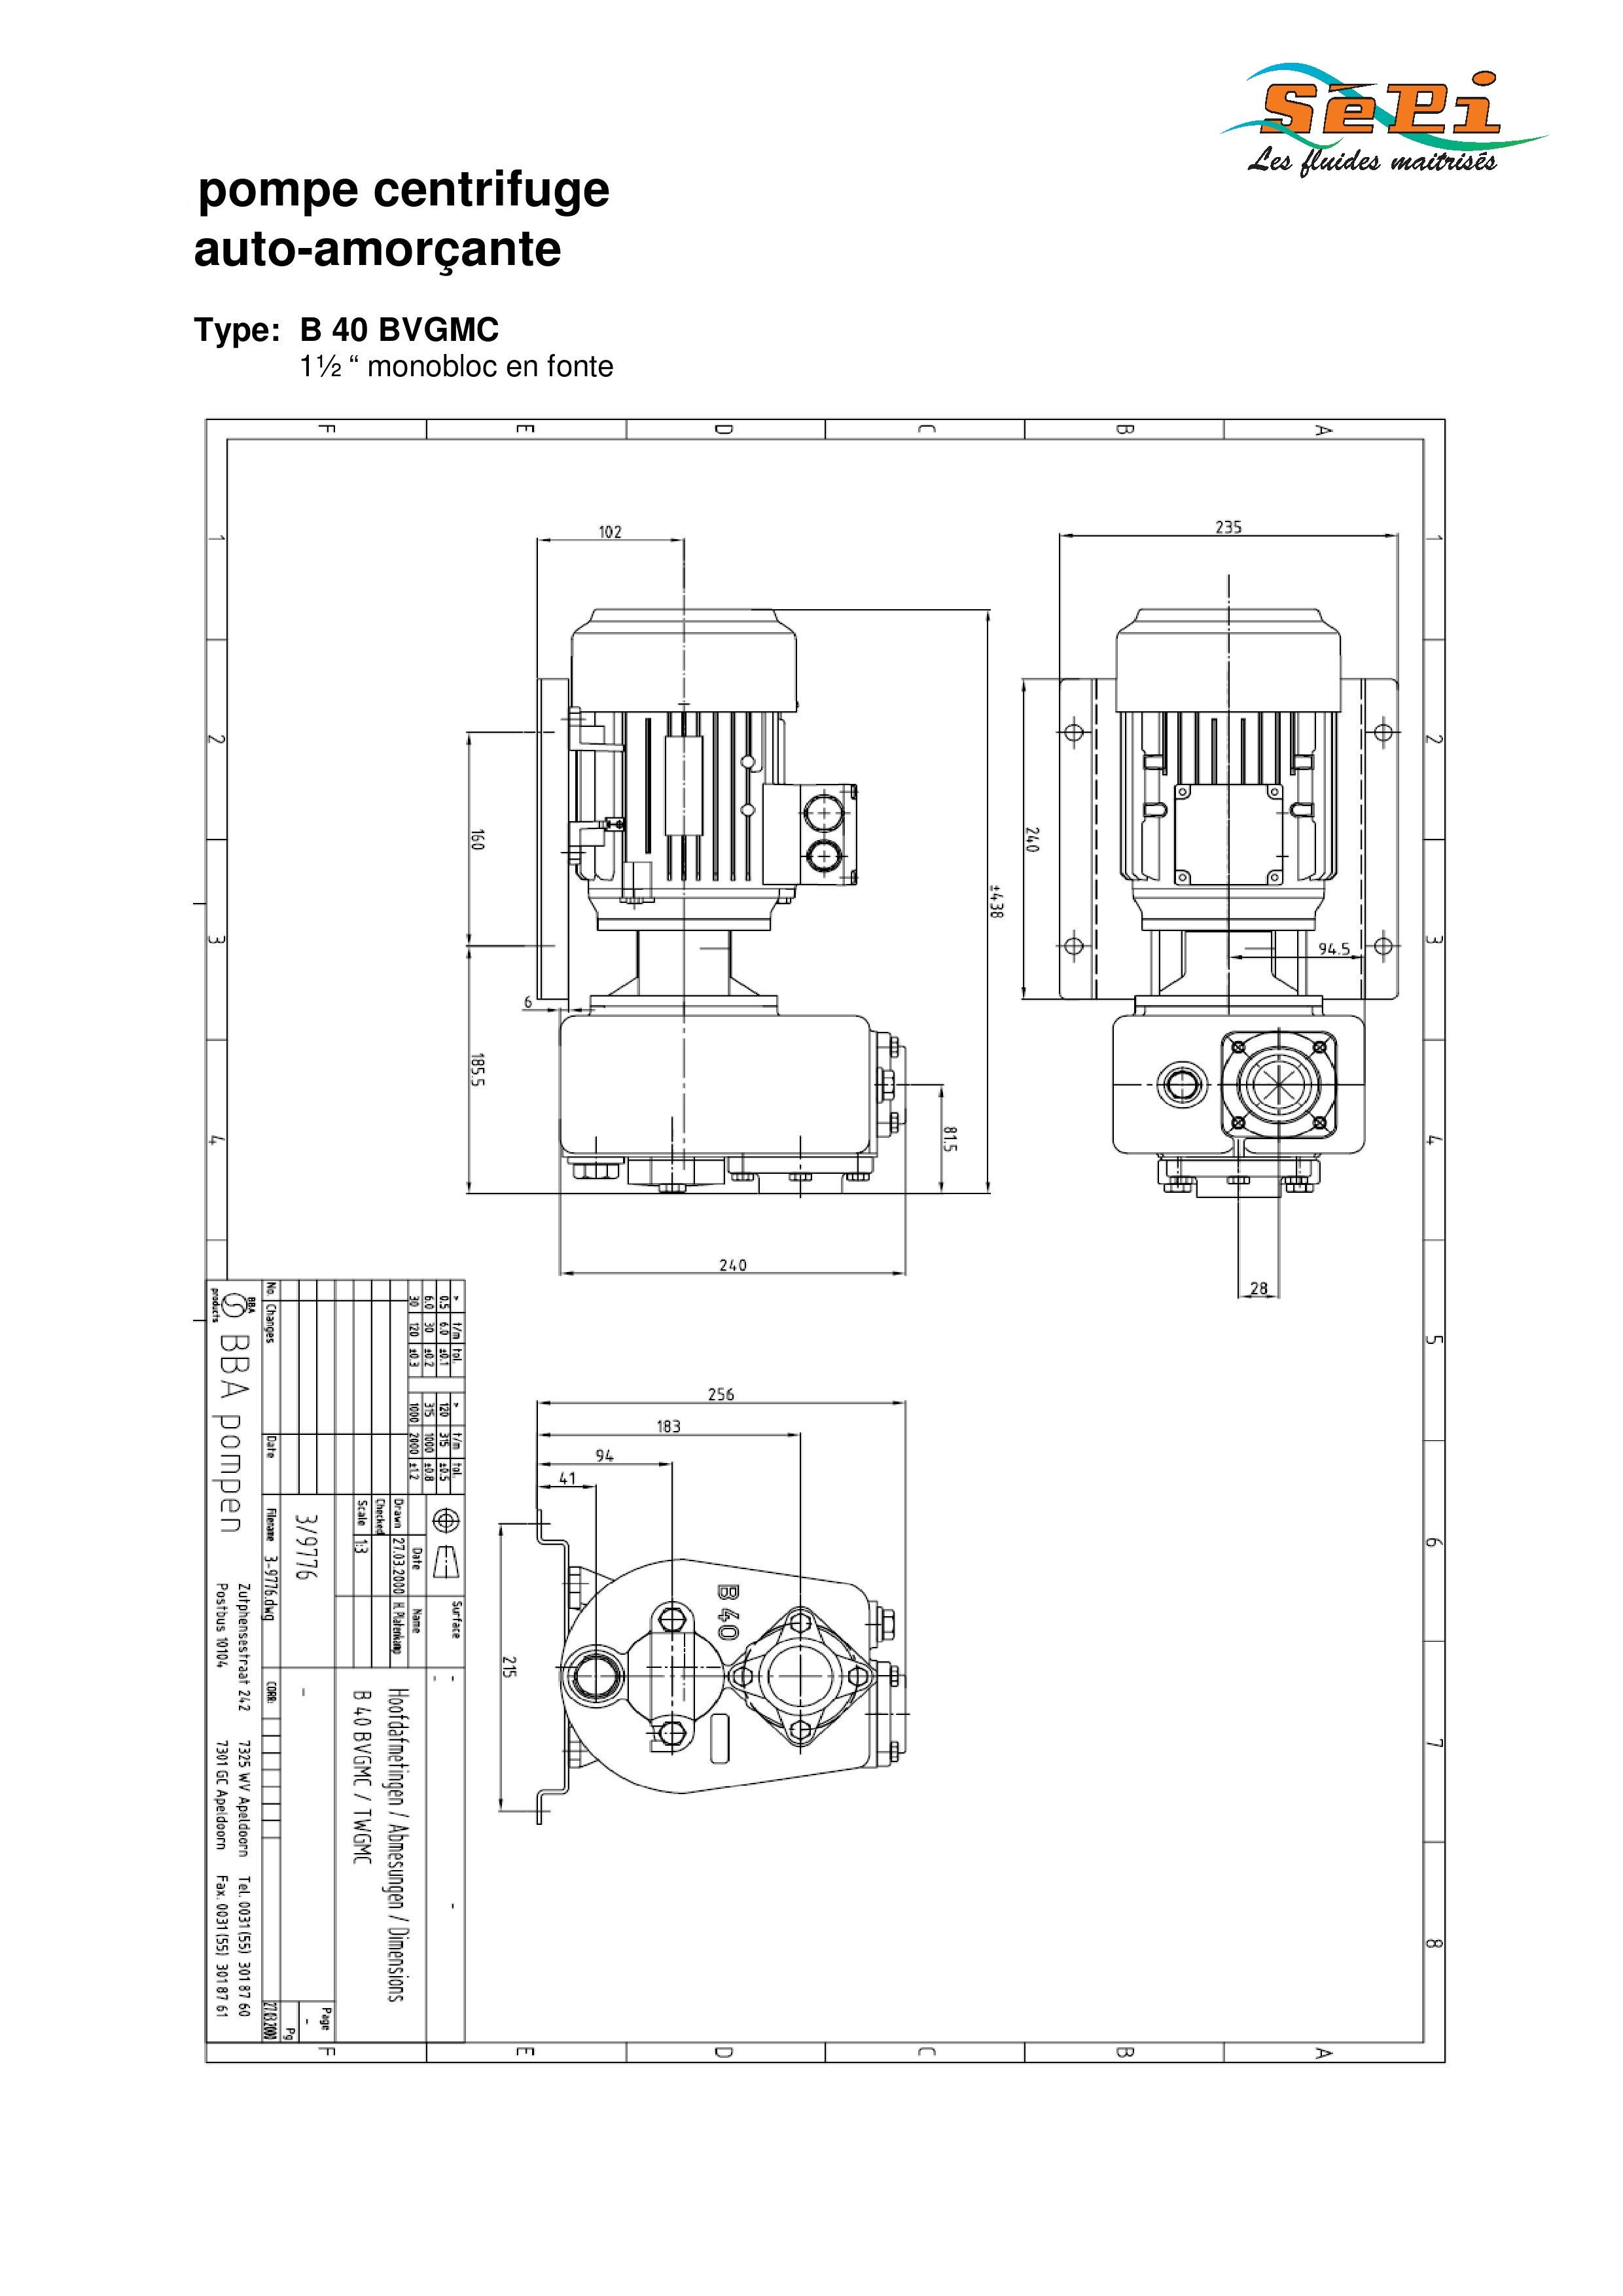 pompe auto amor ante b40 bvgmc. Black Bedroom Furniture Sets. Home Design Ideas